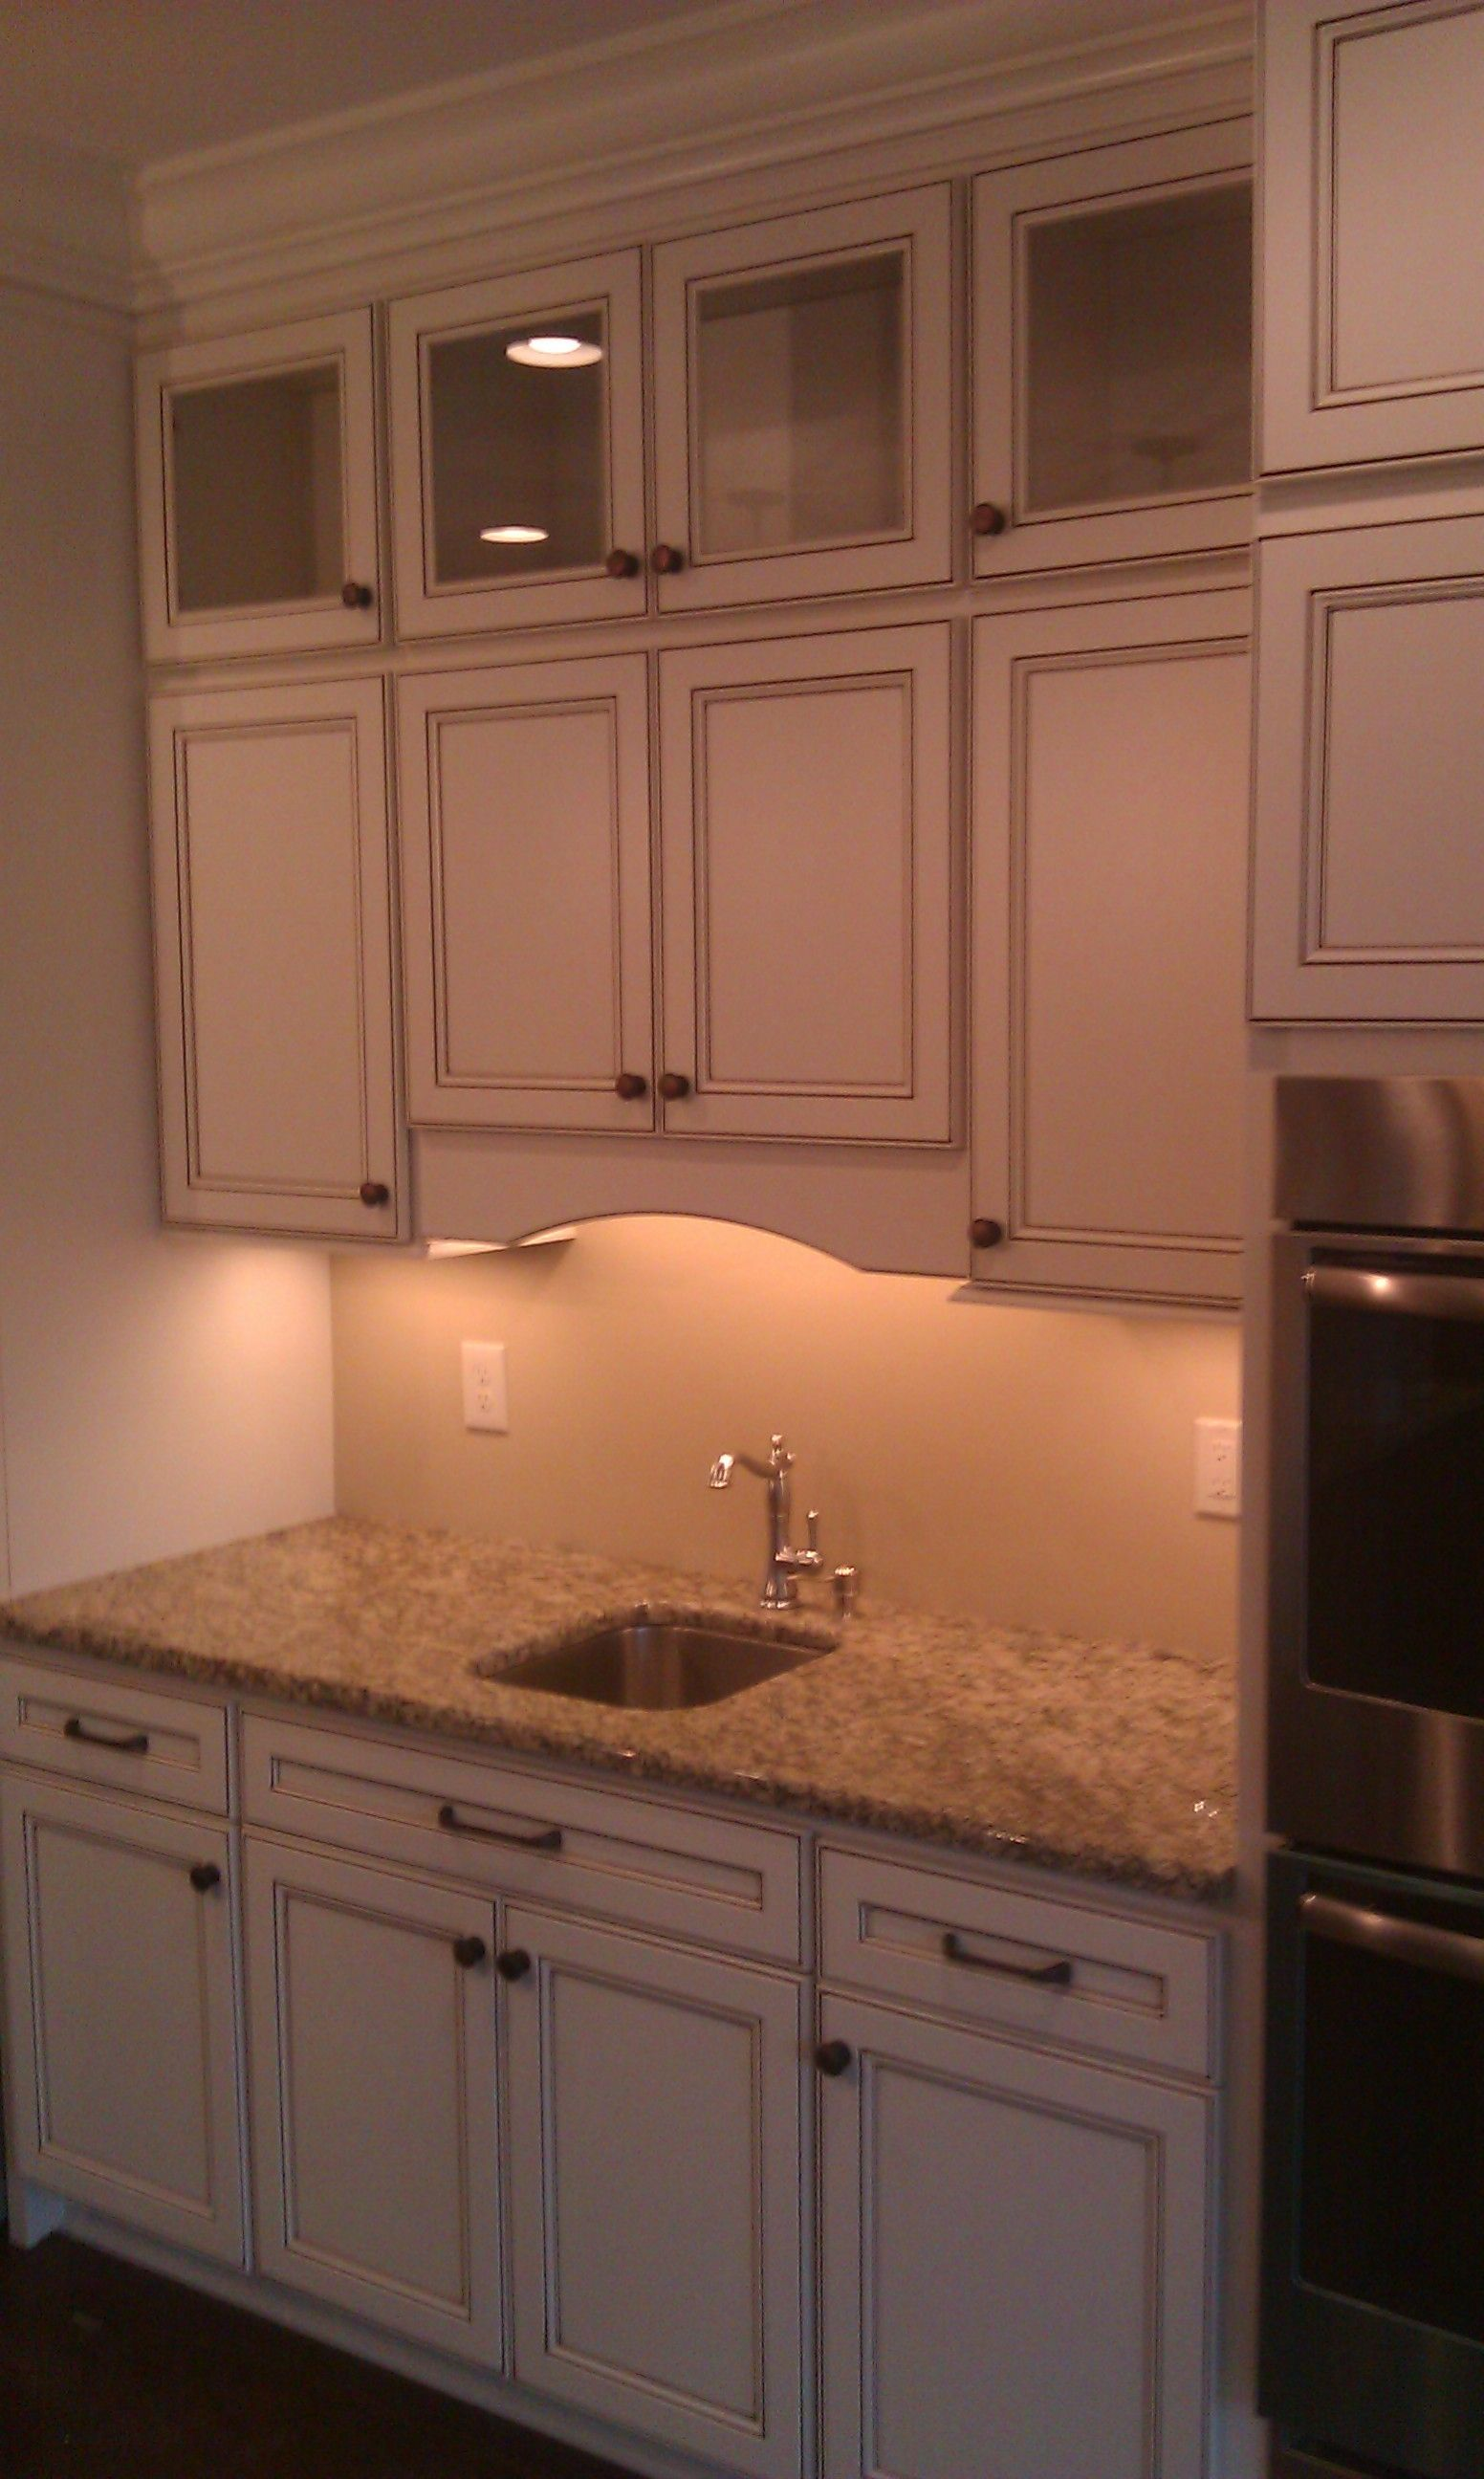 Best Kitchen Gallery: Kitchen Cabi Wet Bar Homecrest Cabi Ry Eastport Maple of Homecrest Kitchen Cabinets on cal-ite.com